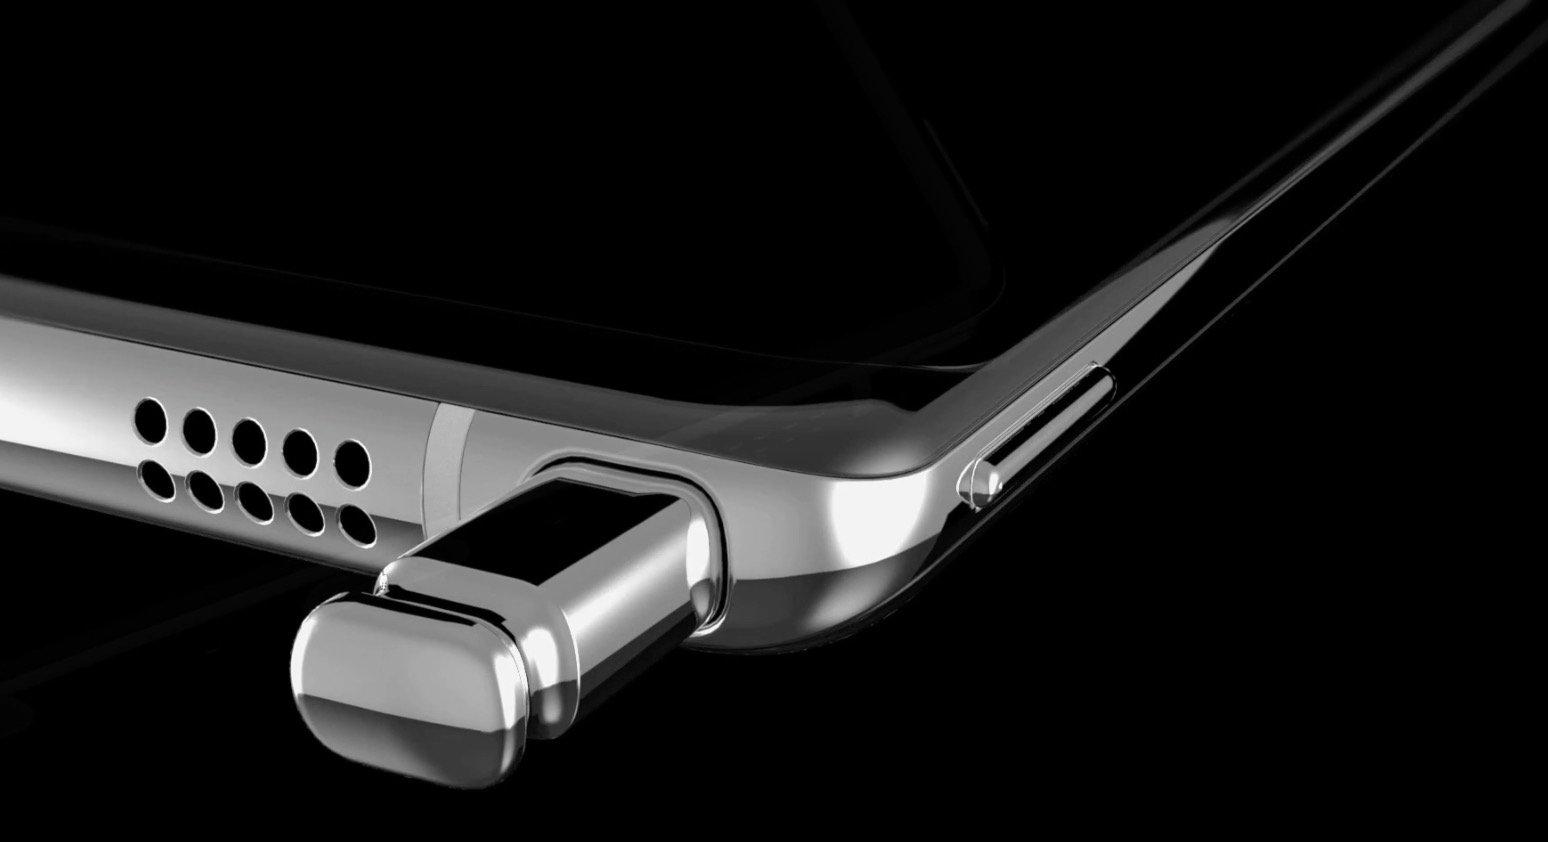 Концепт фаблета Samsung Galaxy Note 8